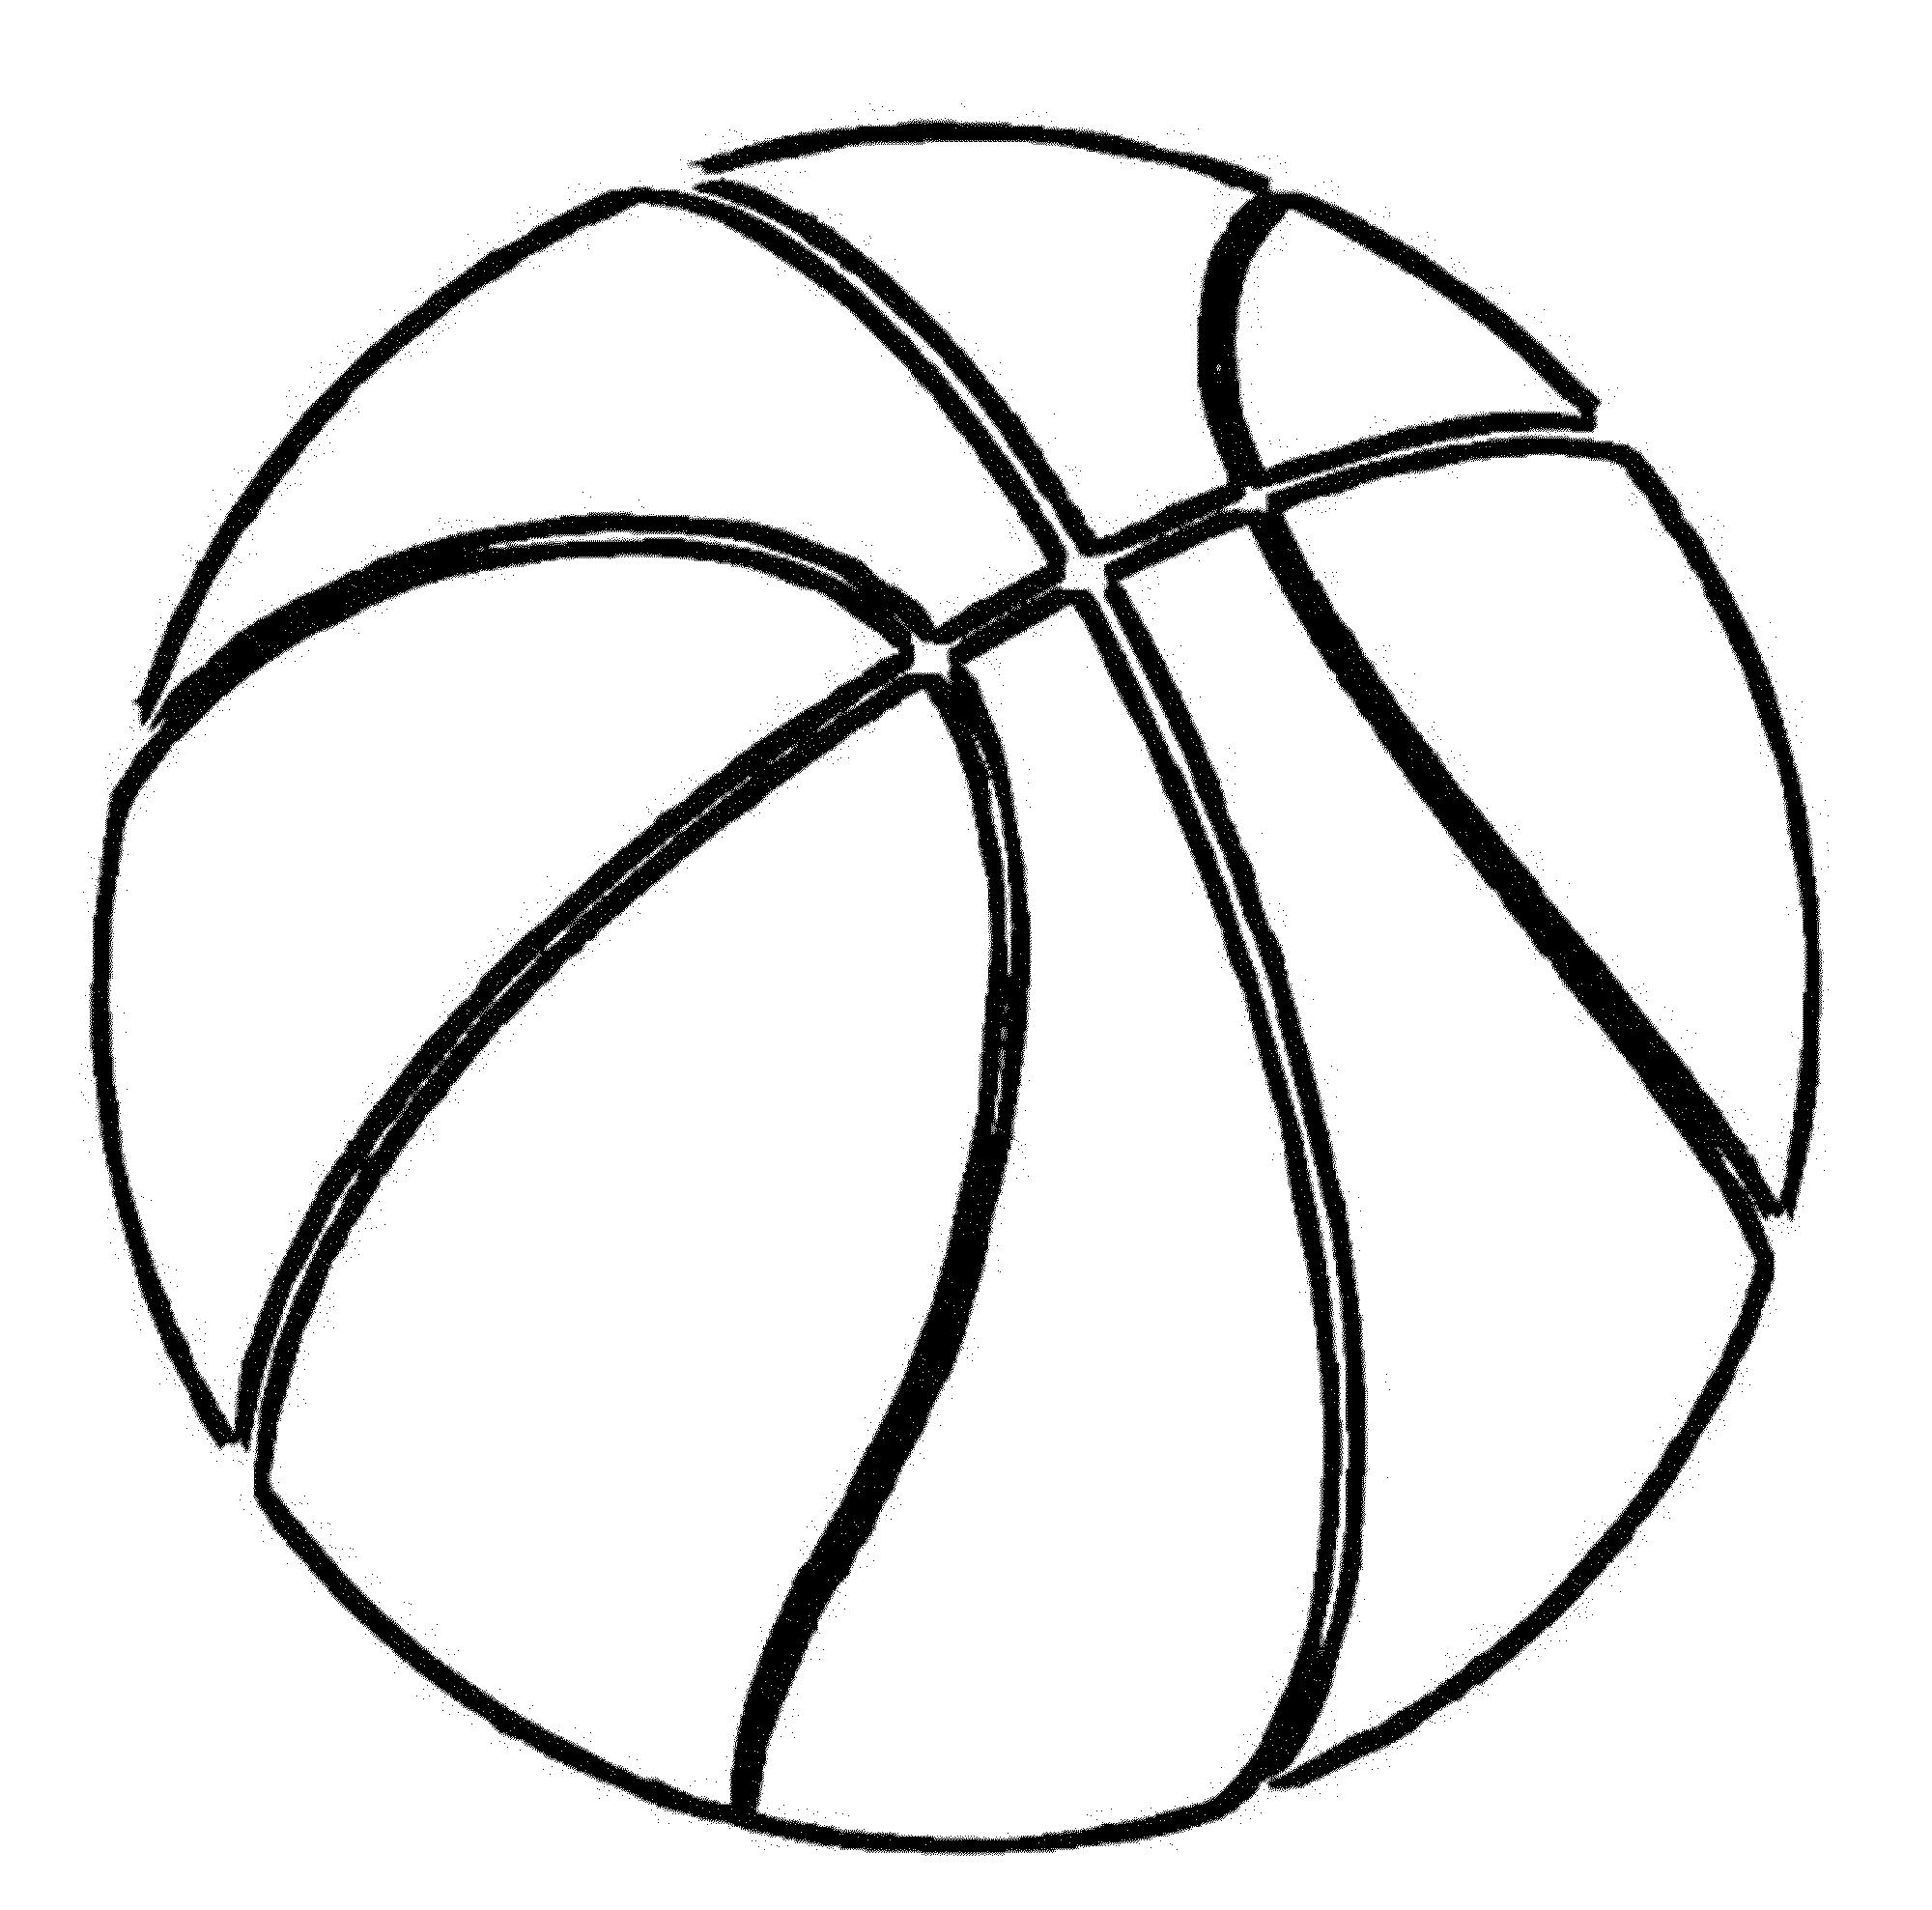 basketball pictures to color basketball coloring pages for adults coloring home pictures to color basketball